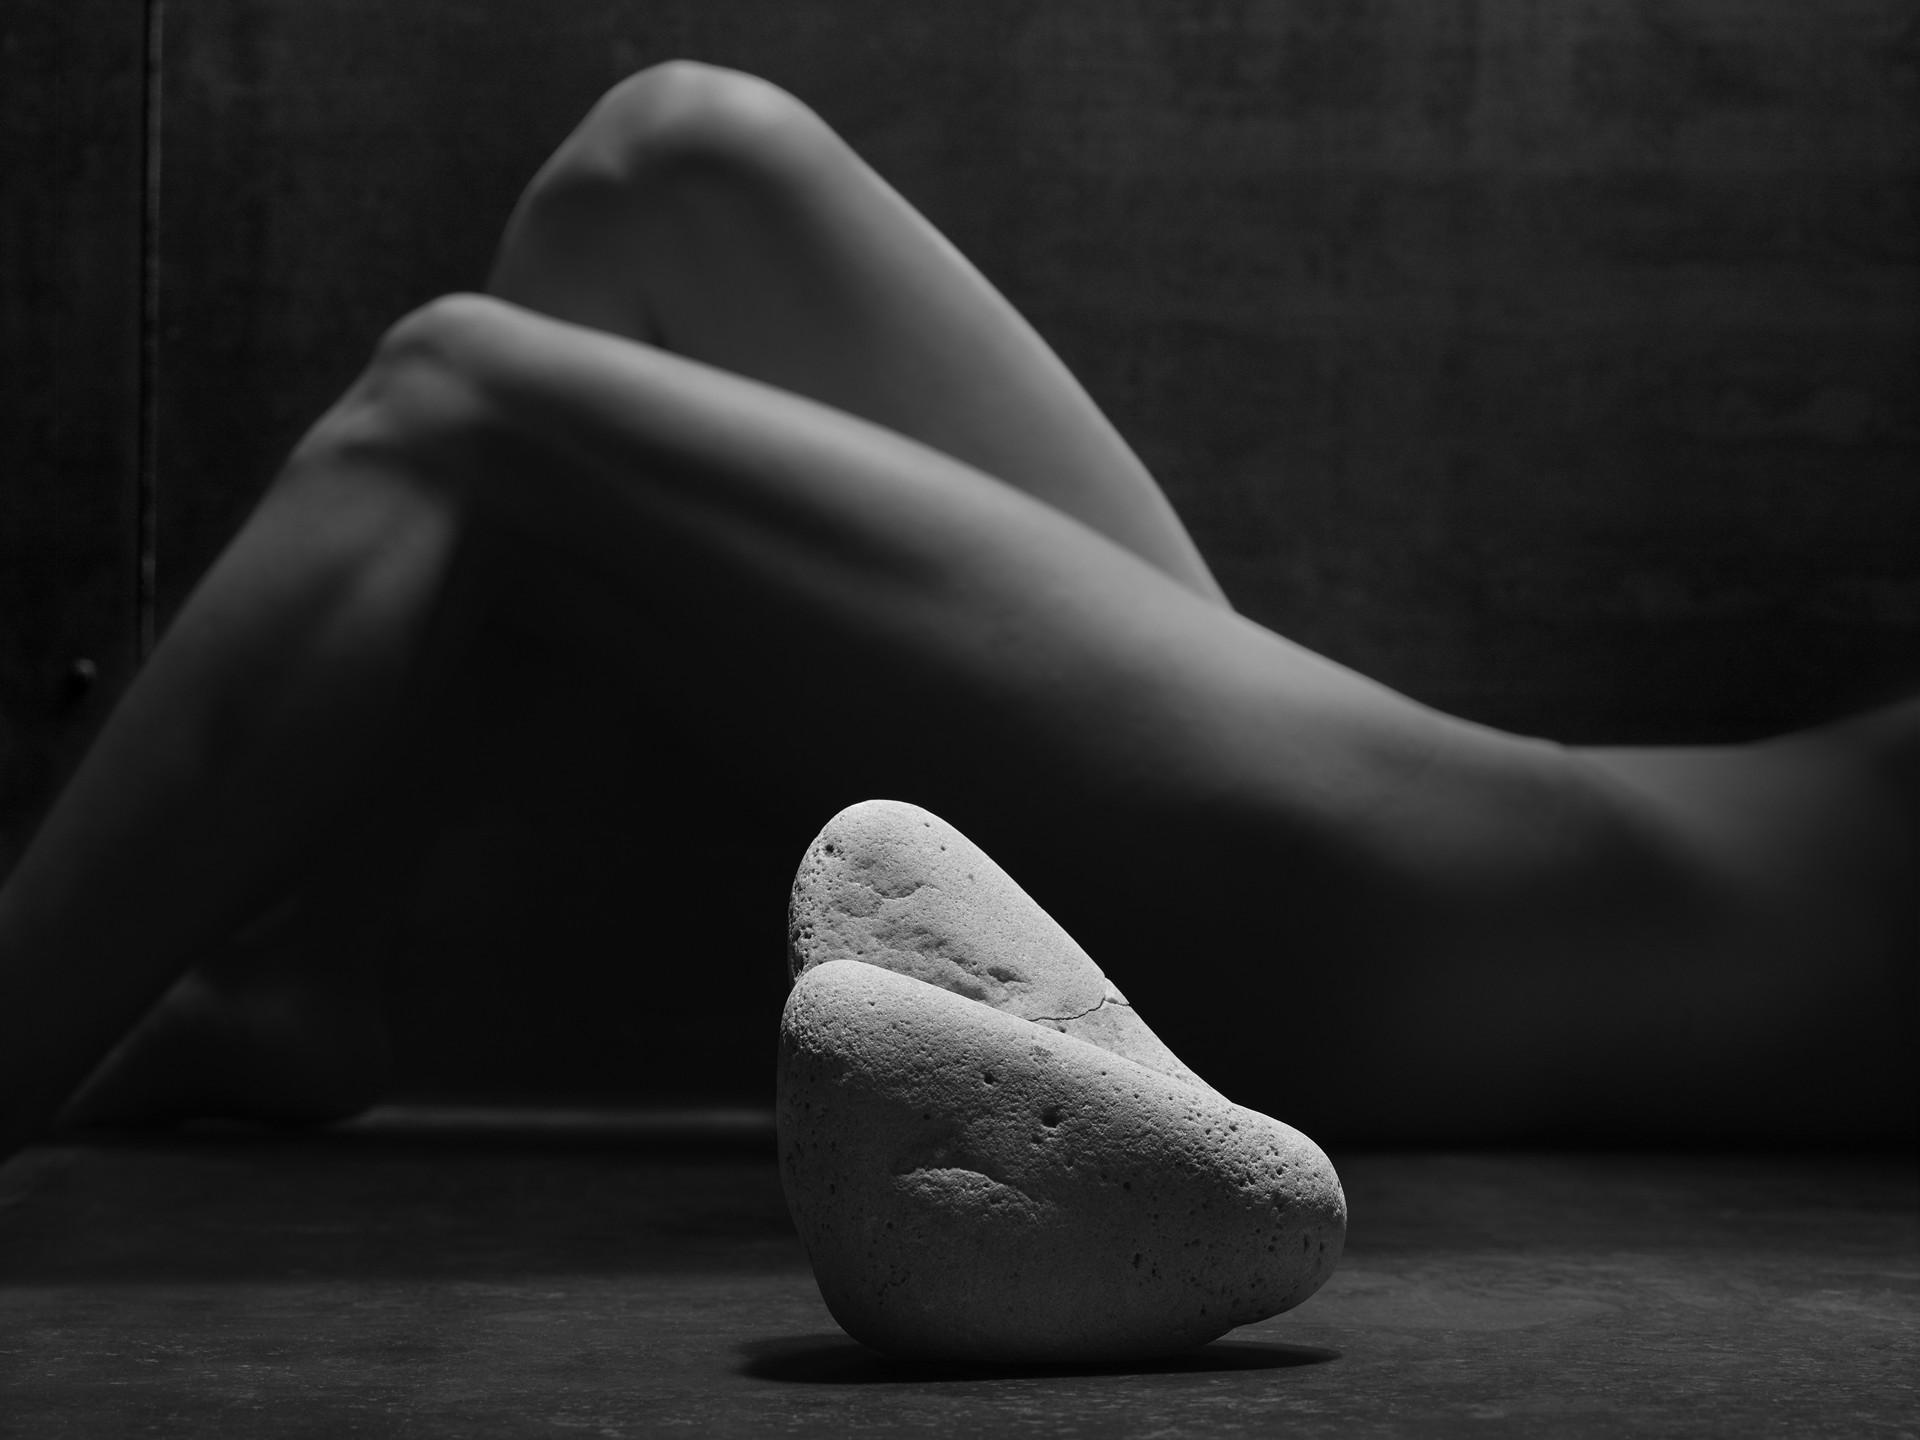 Femur by Frank Sherwood White